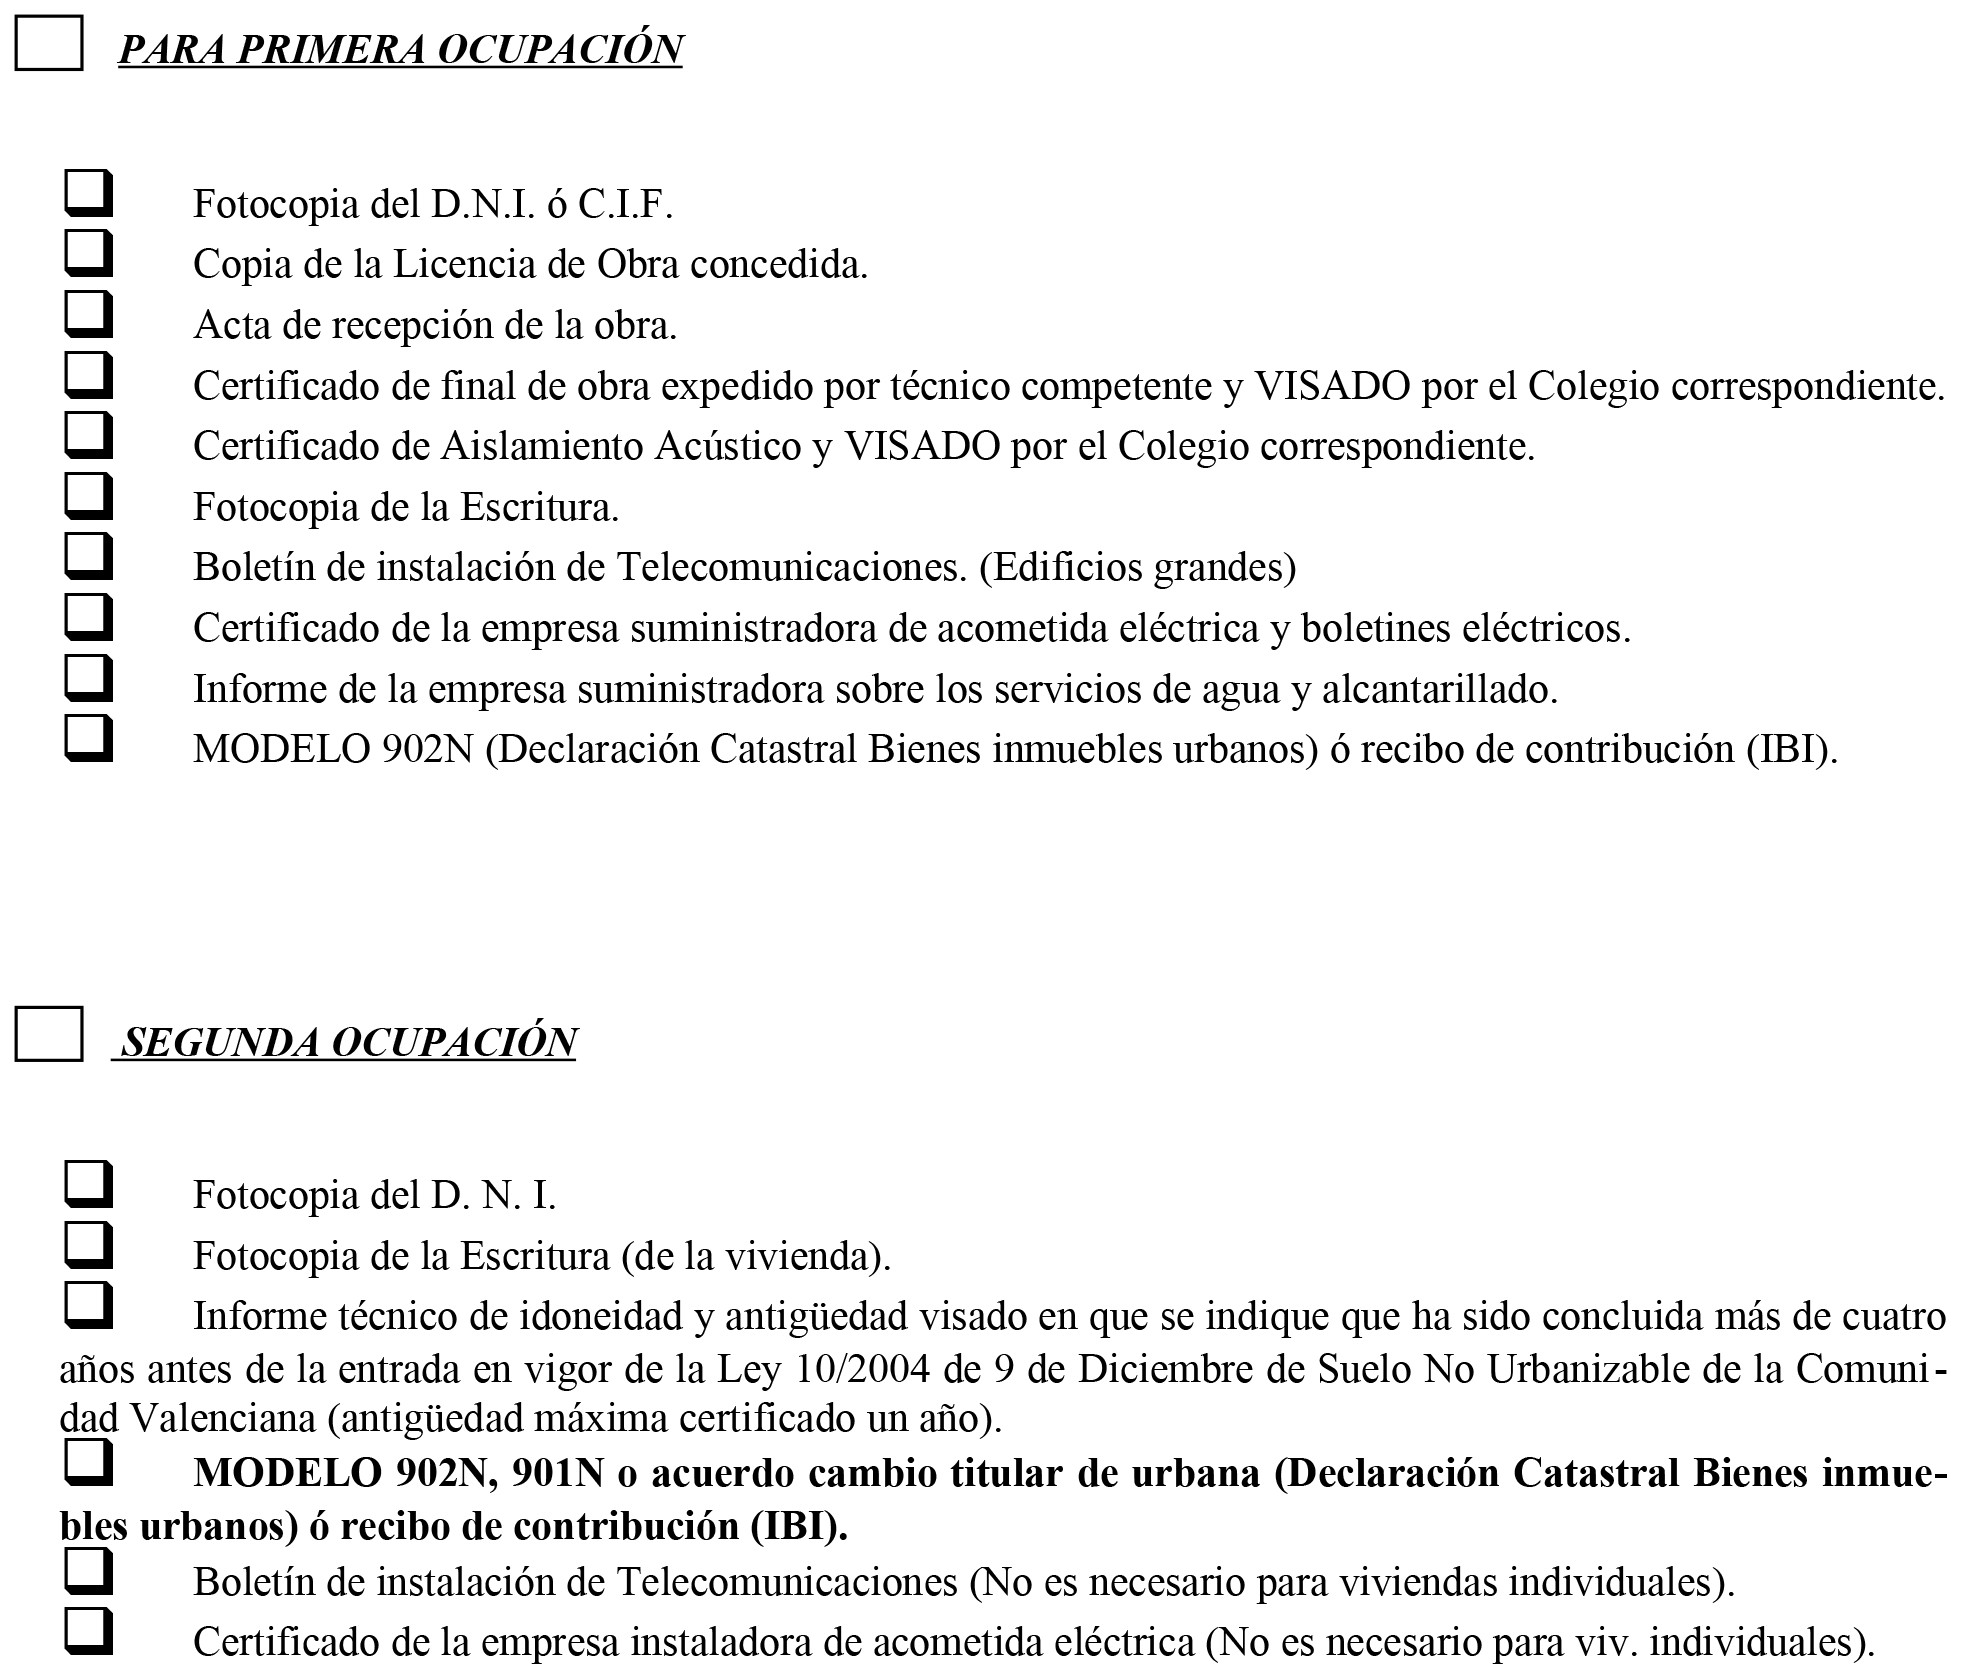 Impreso Declaración Responsable Segunda Ocupación Hondón de los Frailes